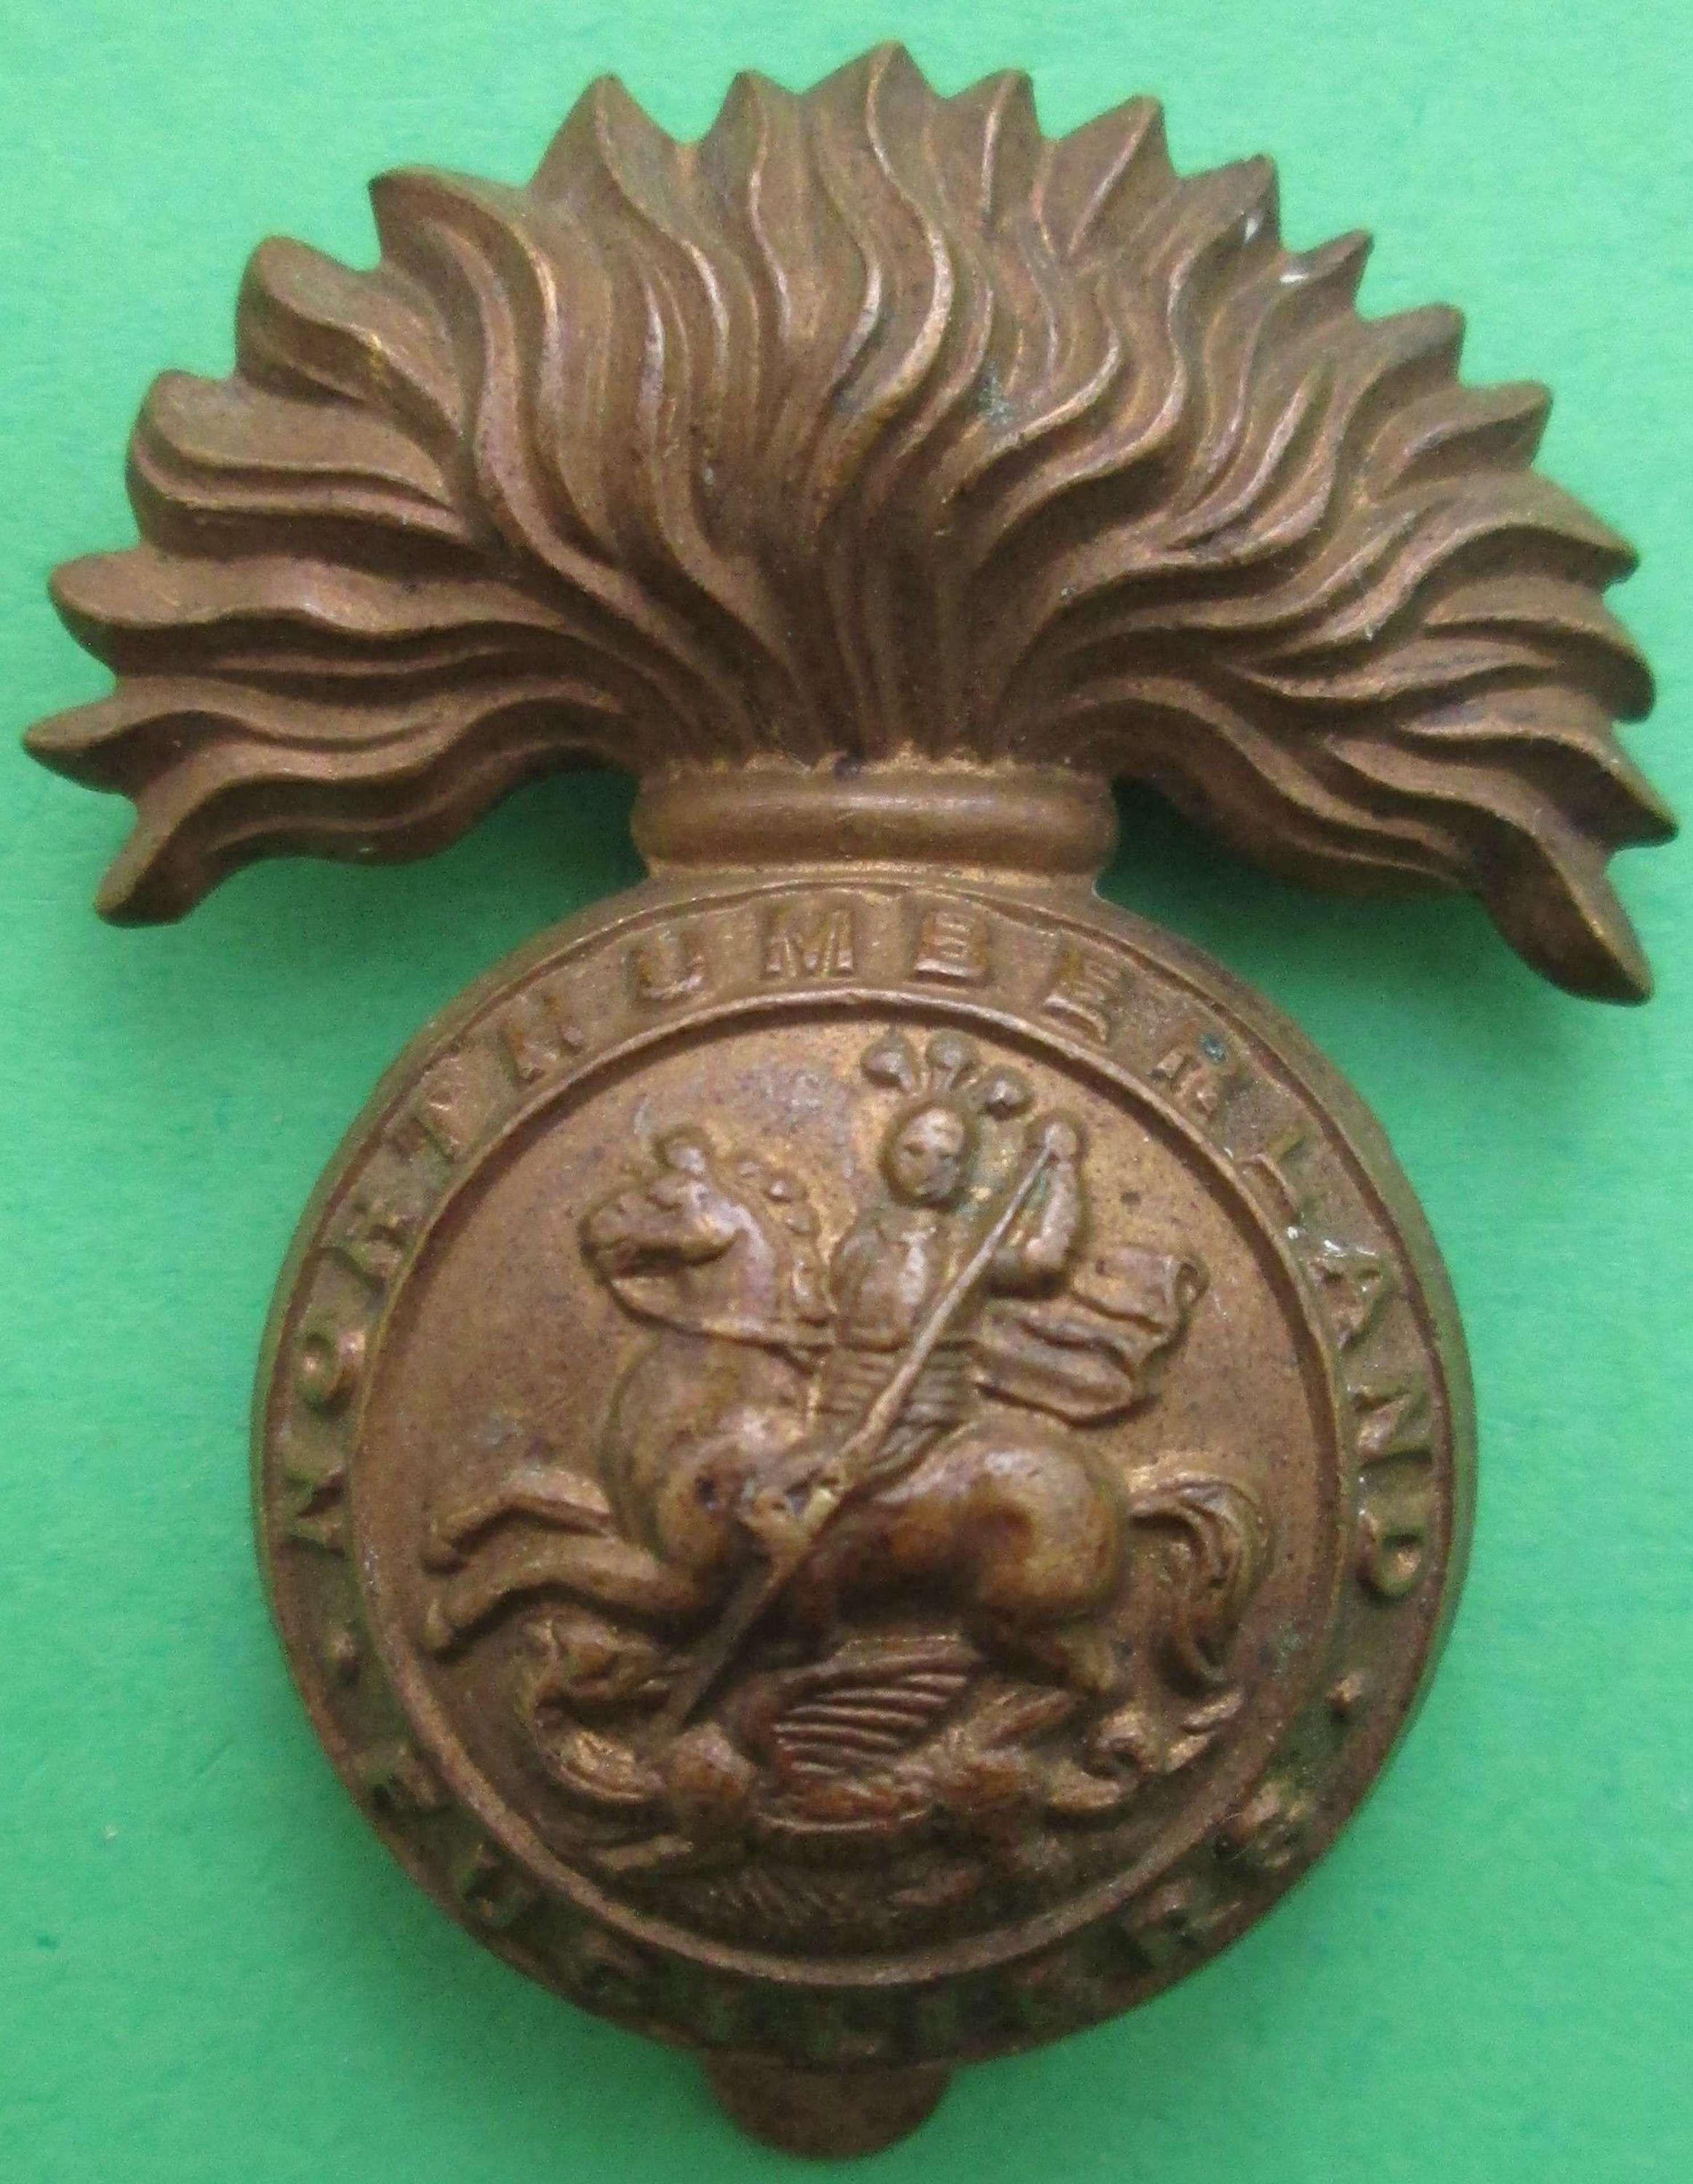 WWI PERIOD NORTHUMBERLAND FUSILIERS ECONOMY CAP BADGE